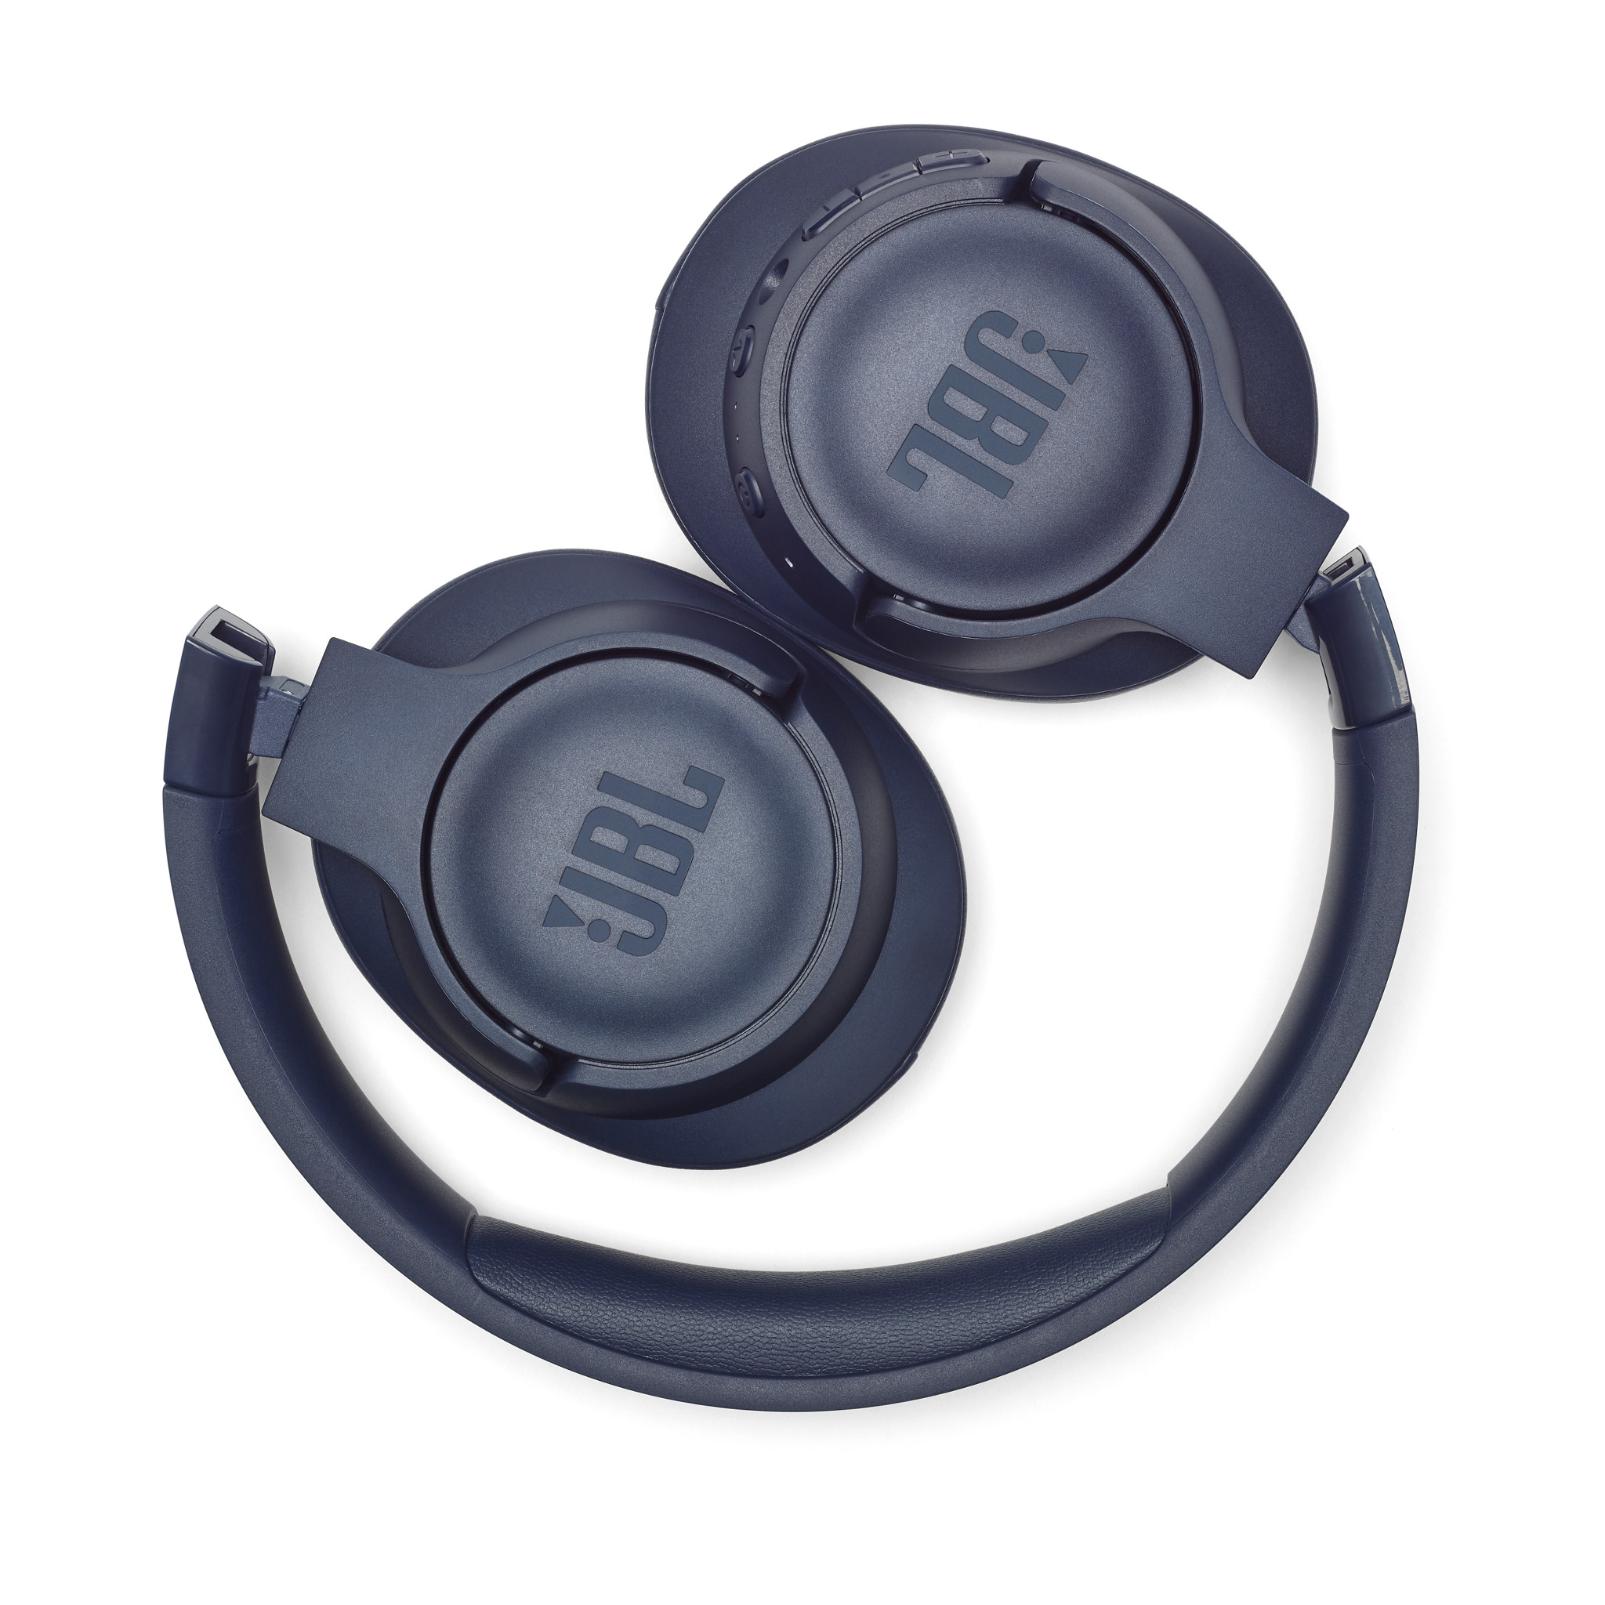 JBL TUNE 750BTNC - Blue - Wireless Over-Ear ANC Headphones - Detailshot 2